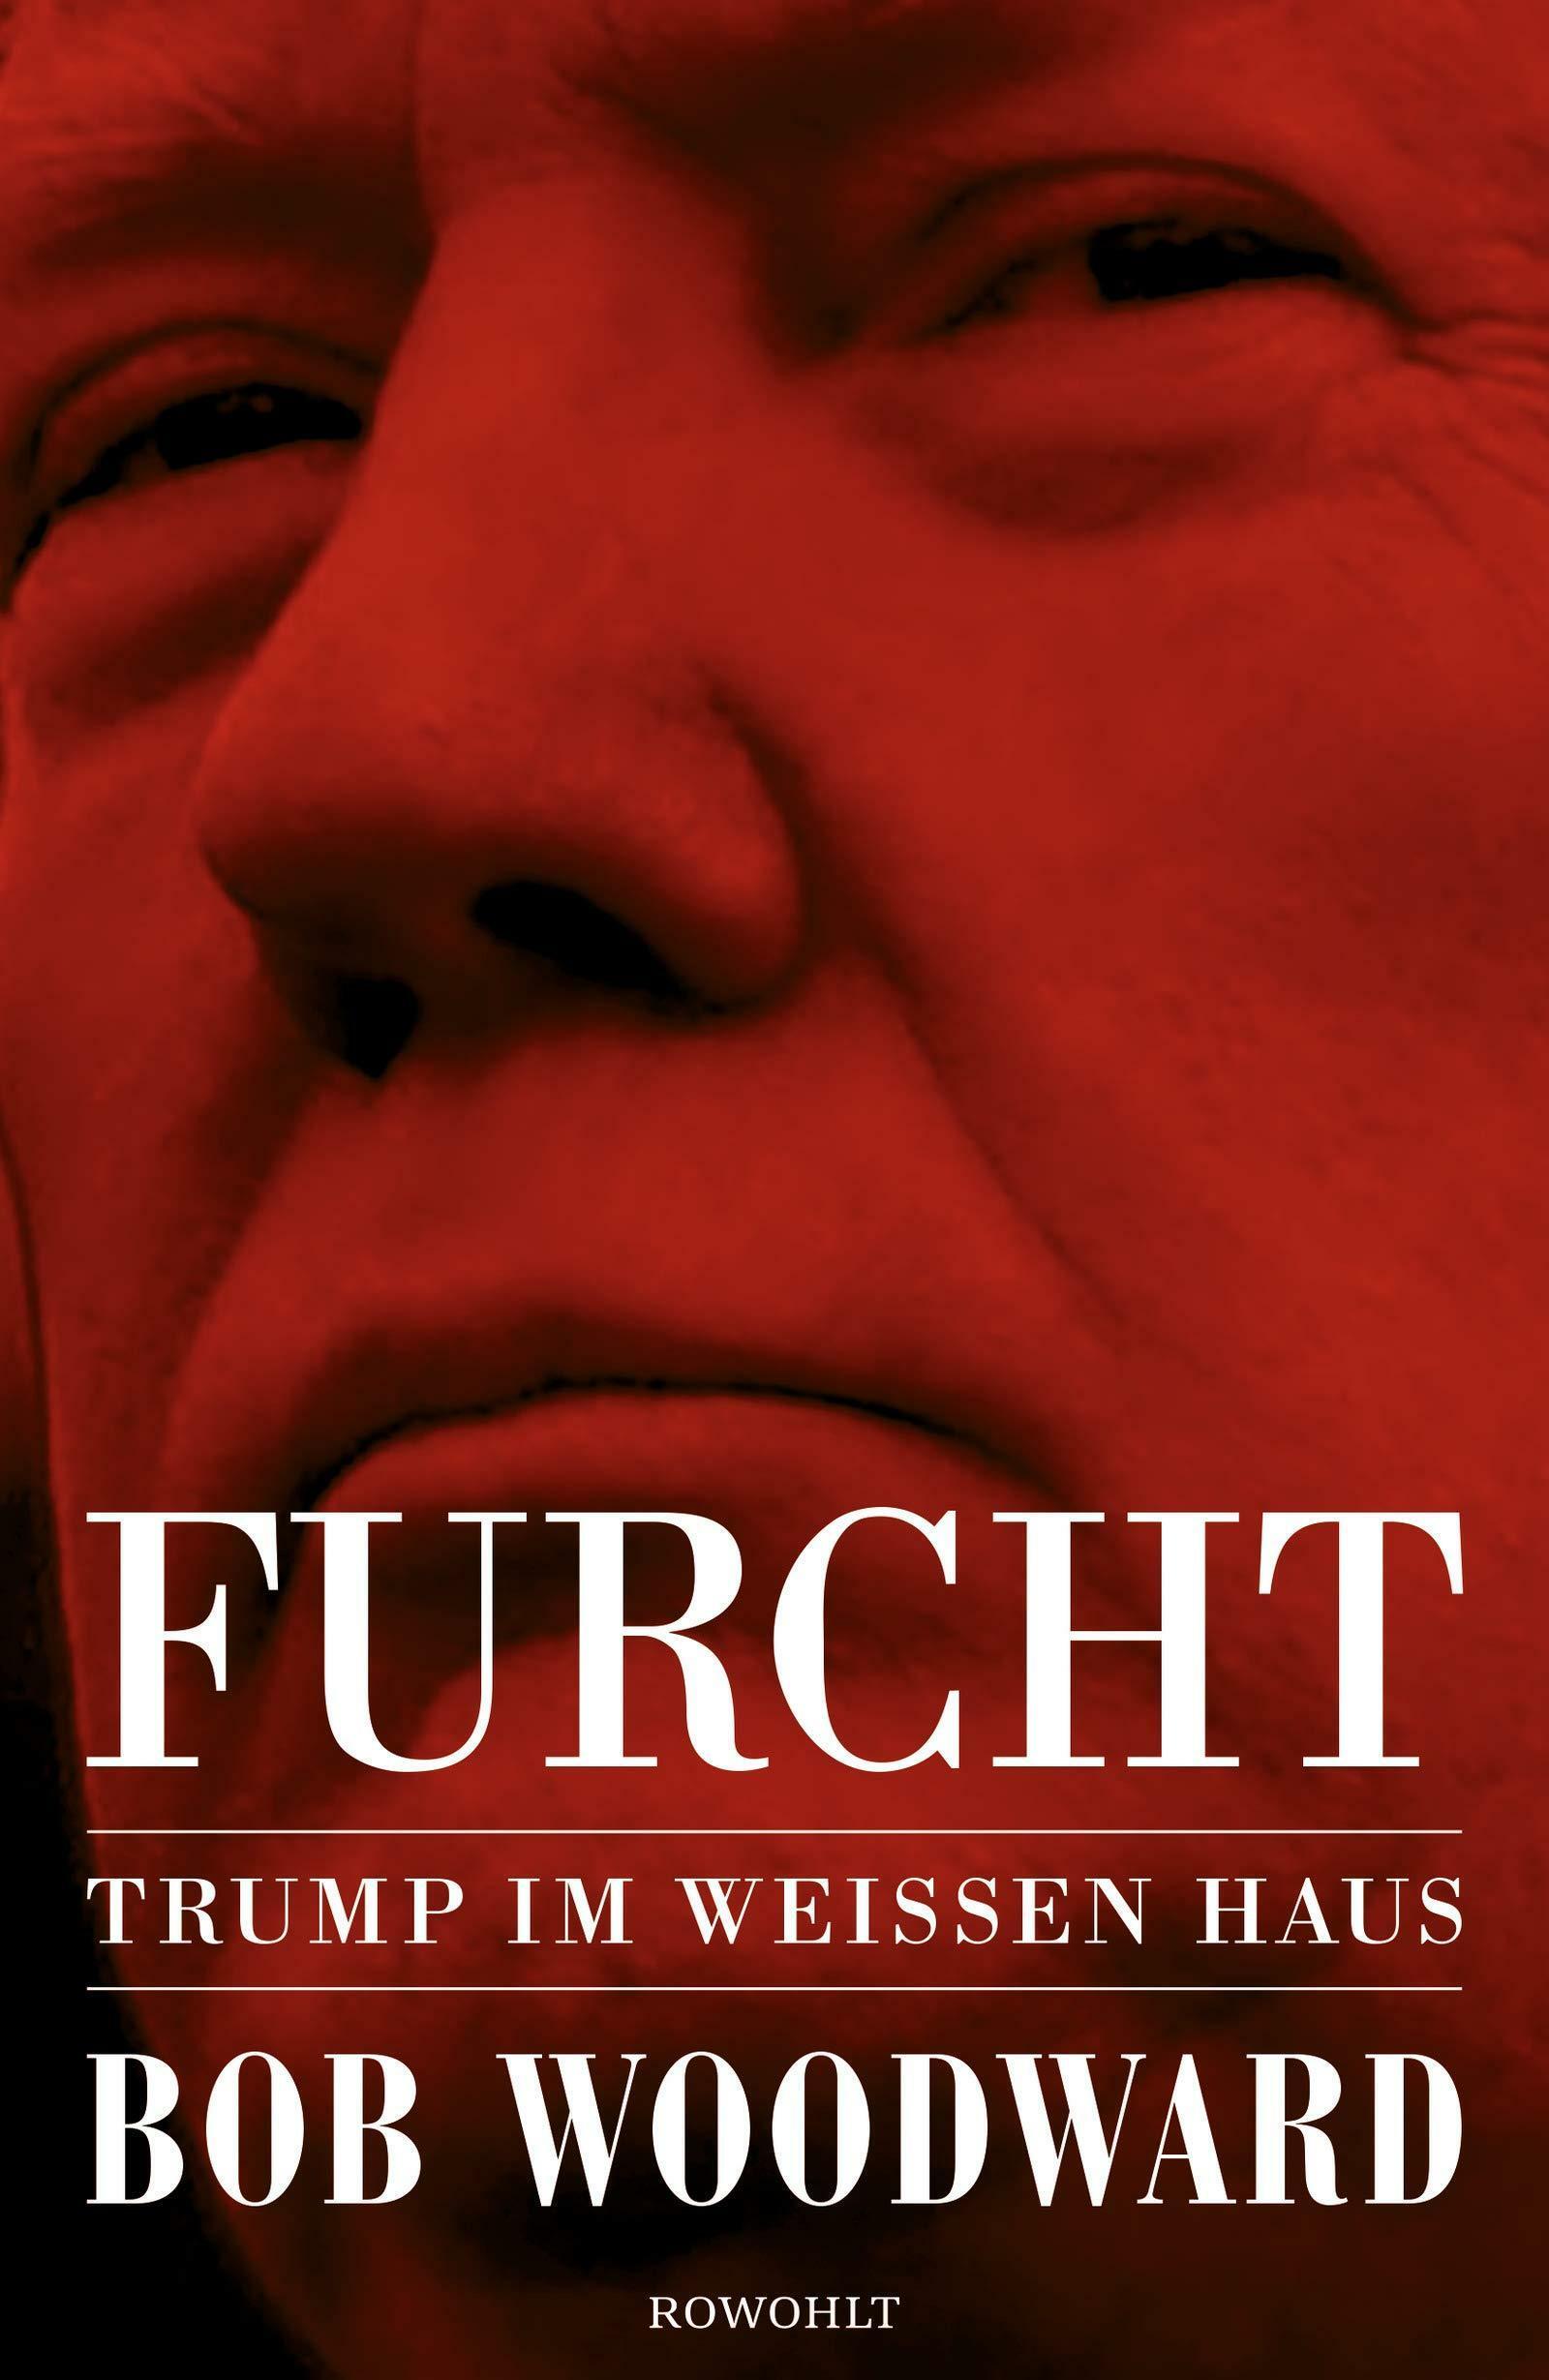 Bob Woodward: Furcht Rowohlt 2018 525 Seiten 22,95 Euro